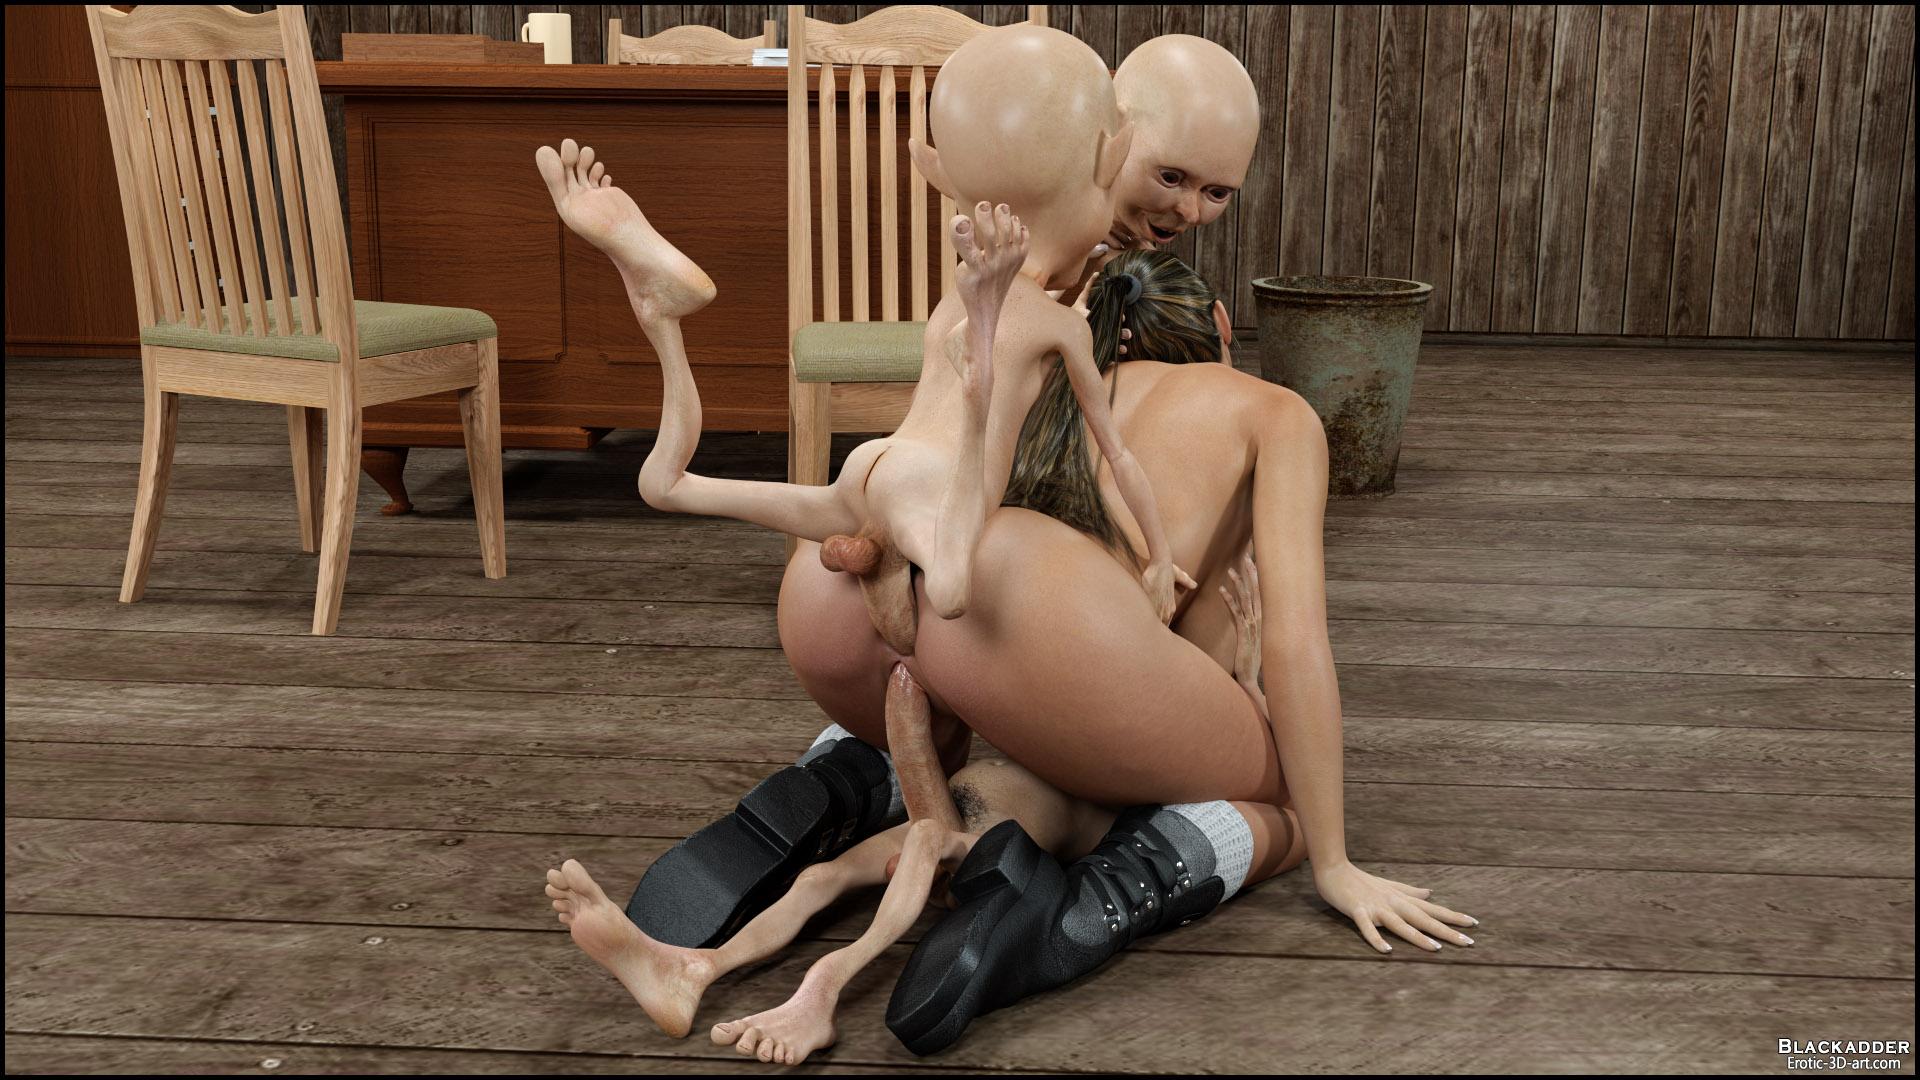 3D Monster Gangbang busty girls gisela gangbangedaliens 3d monsters hentai